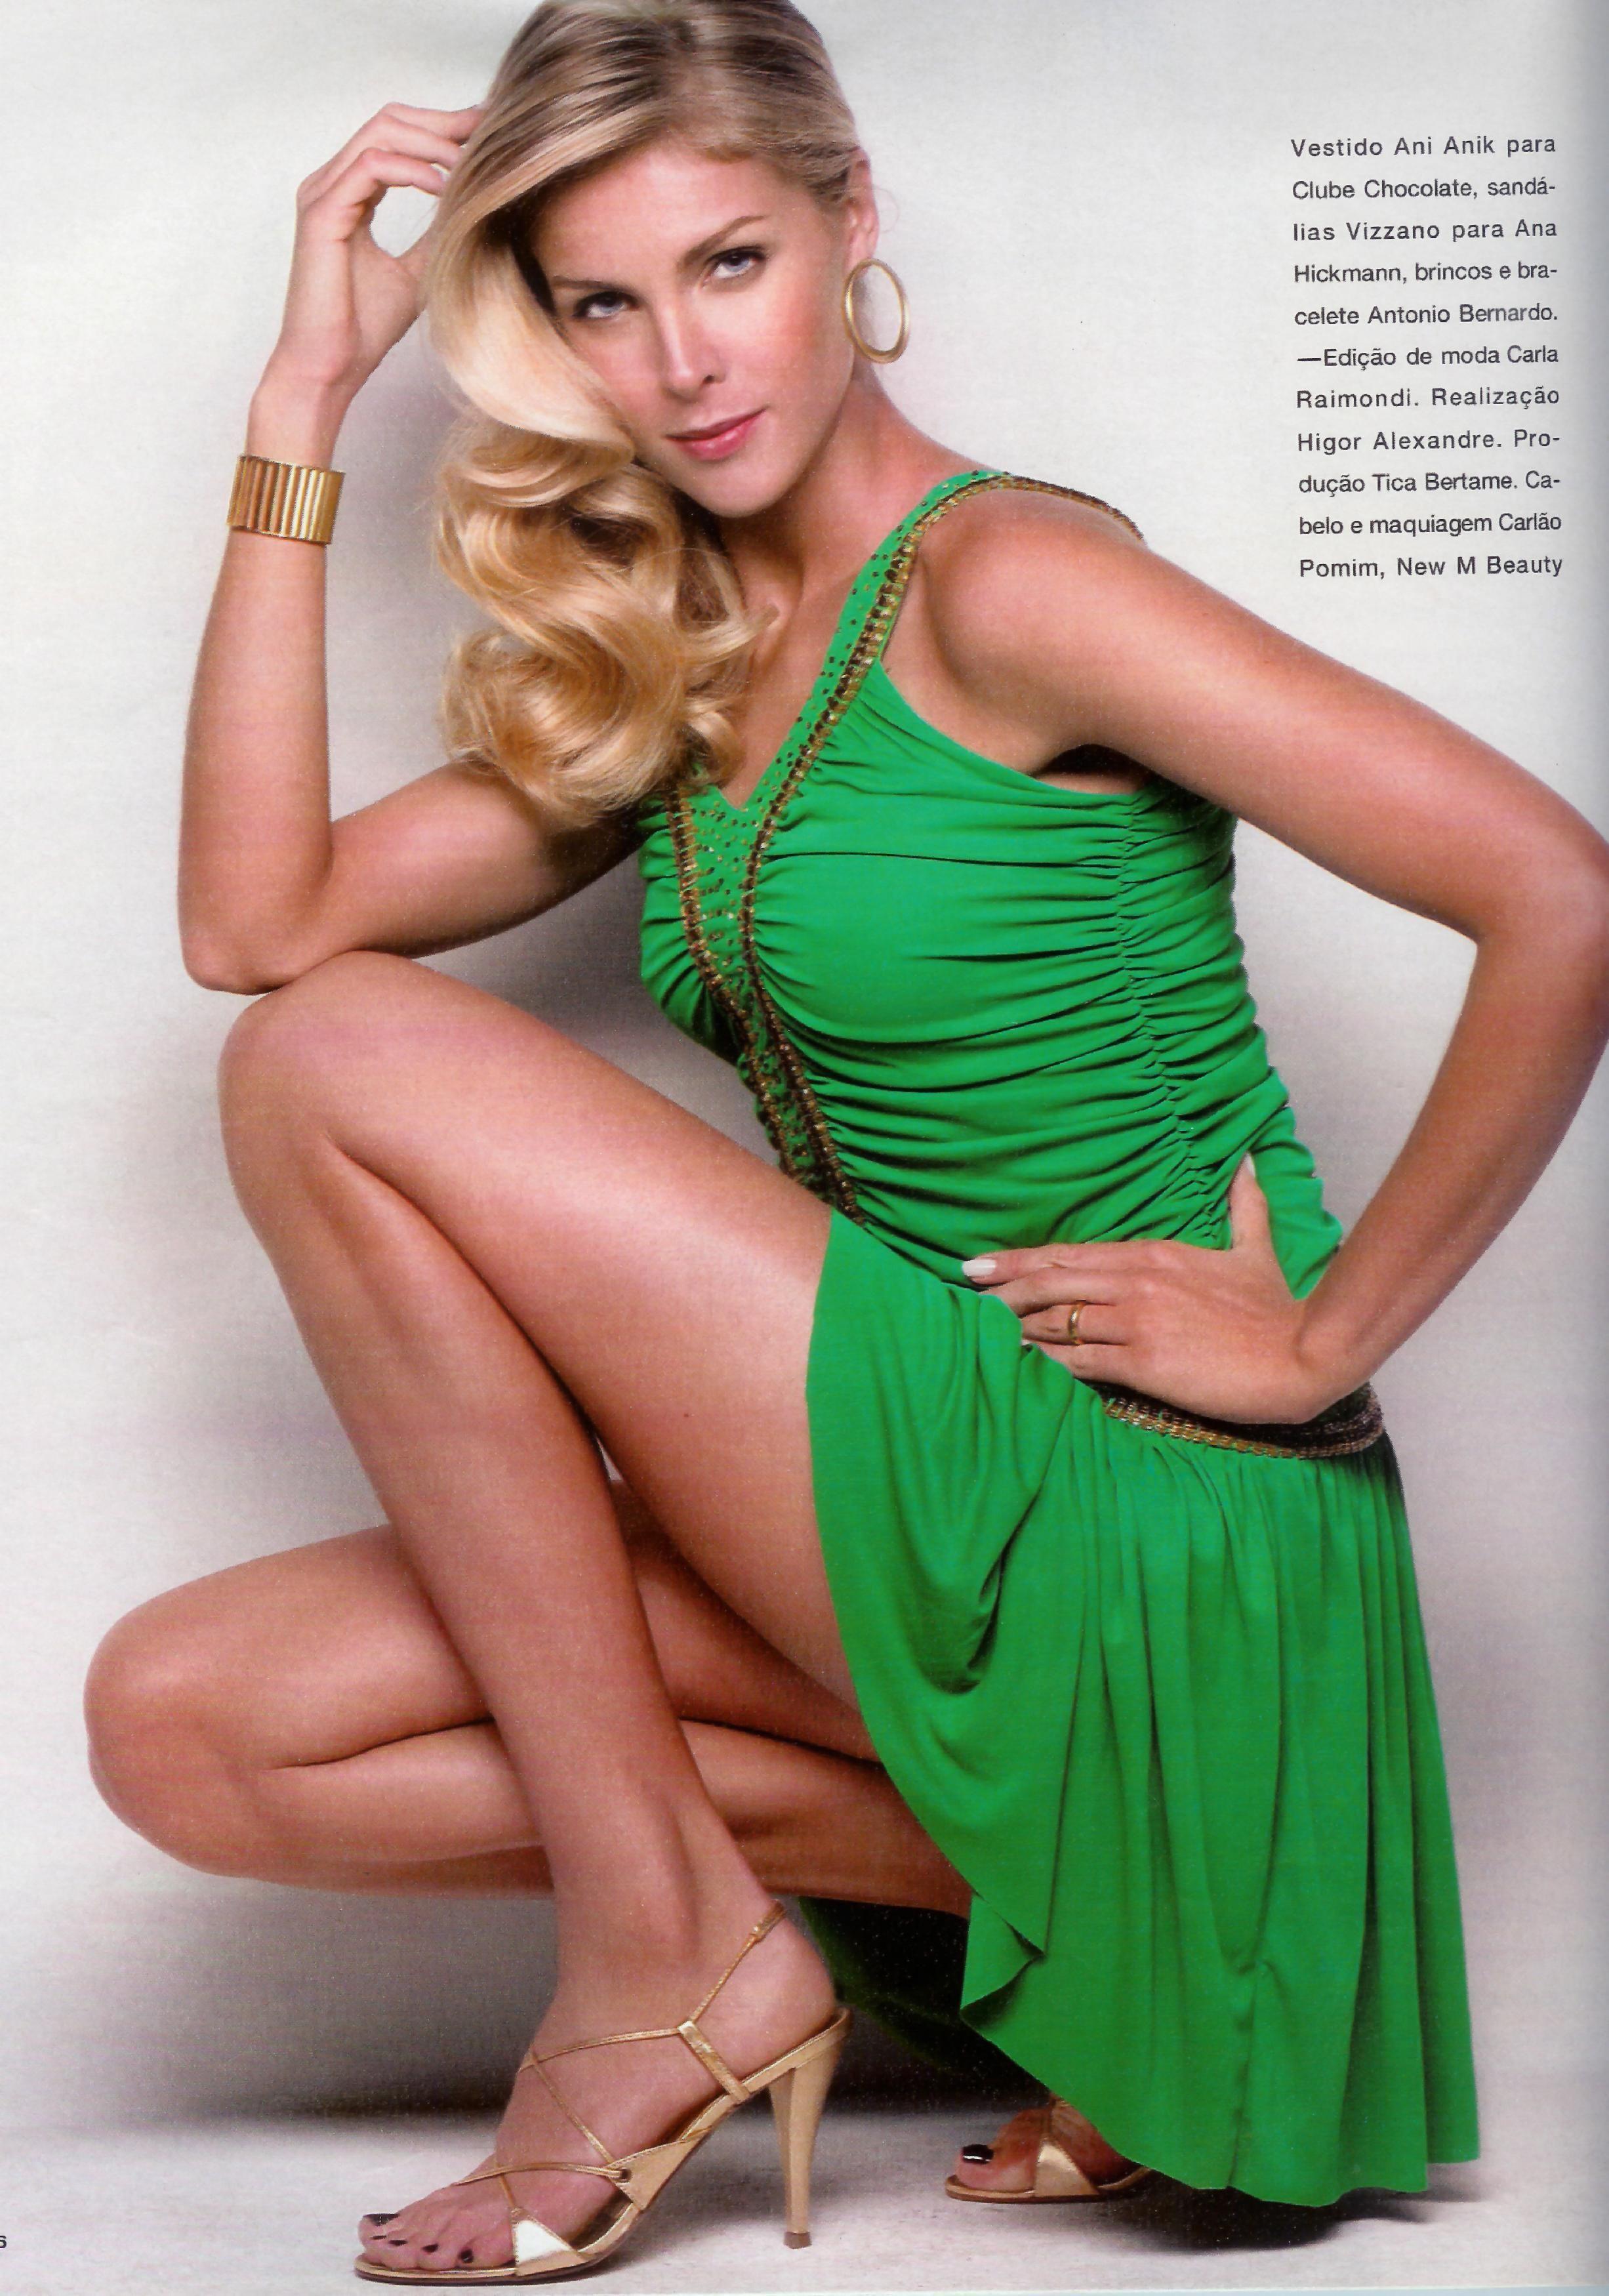 Angelique Boyer Feet   Celebrity Pictures